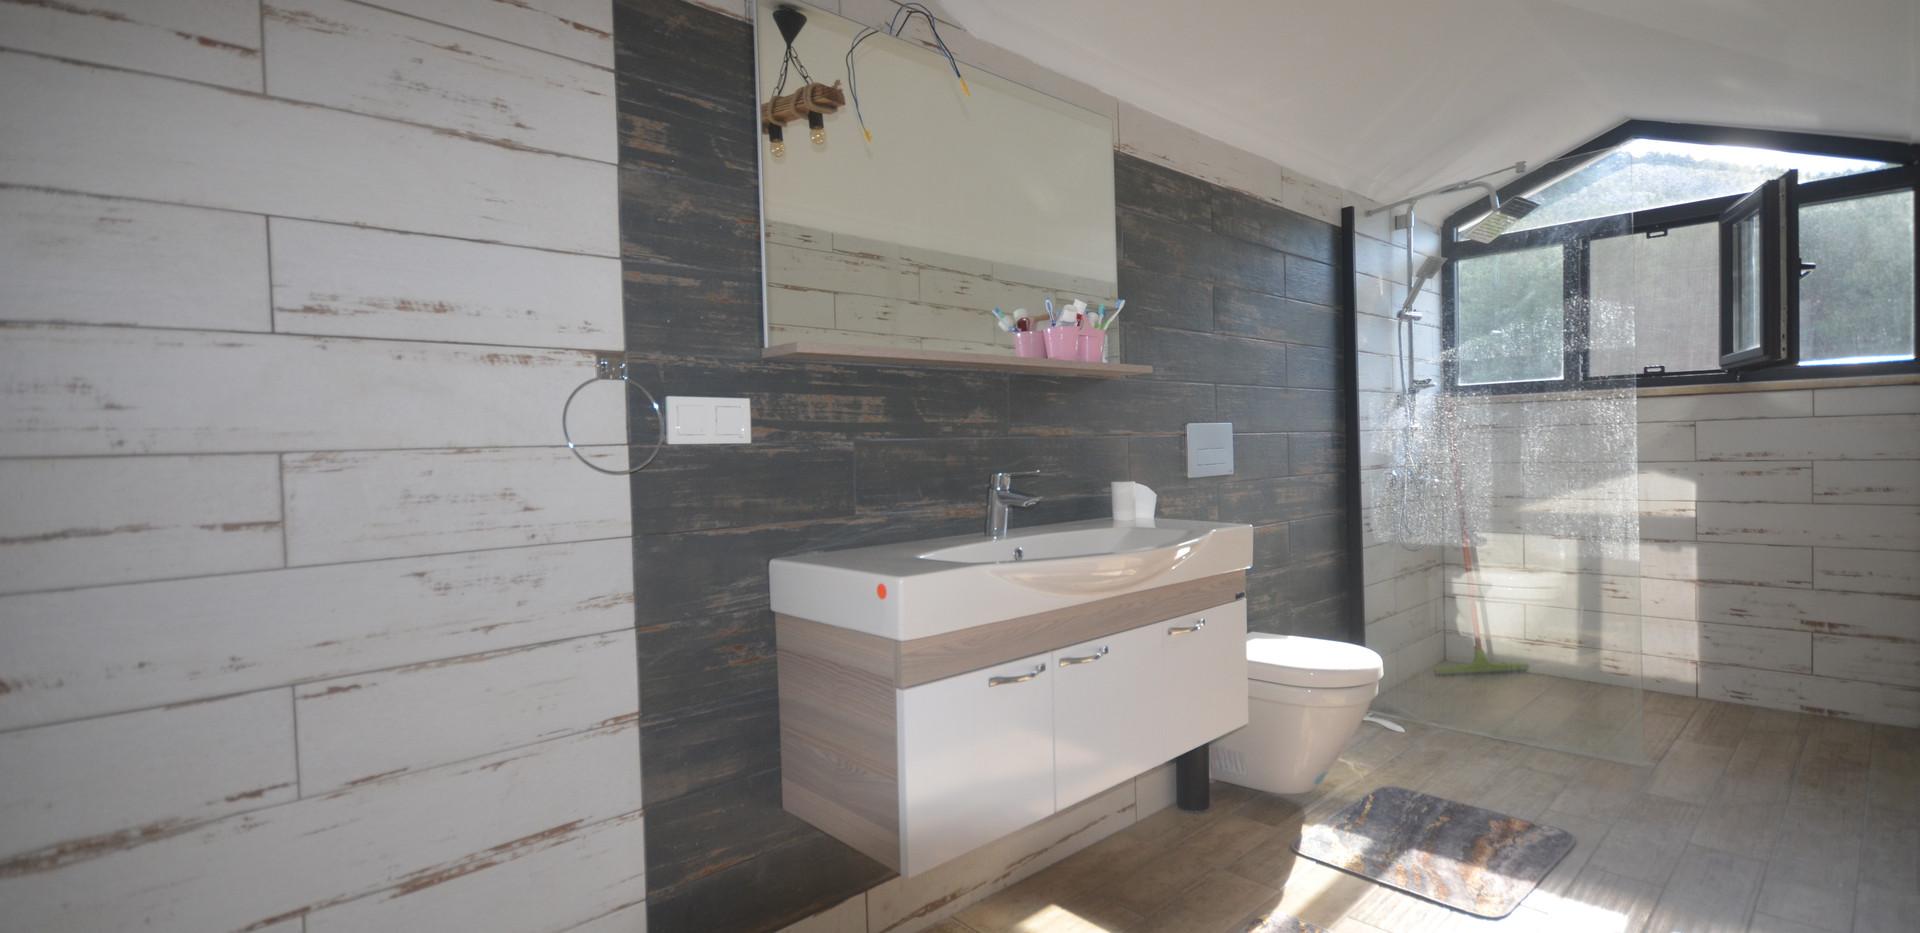 Third Bathroom, Second Floor